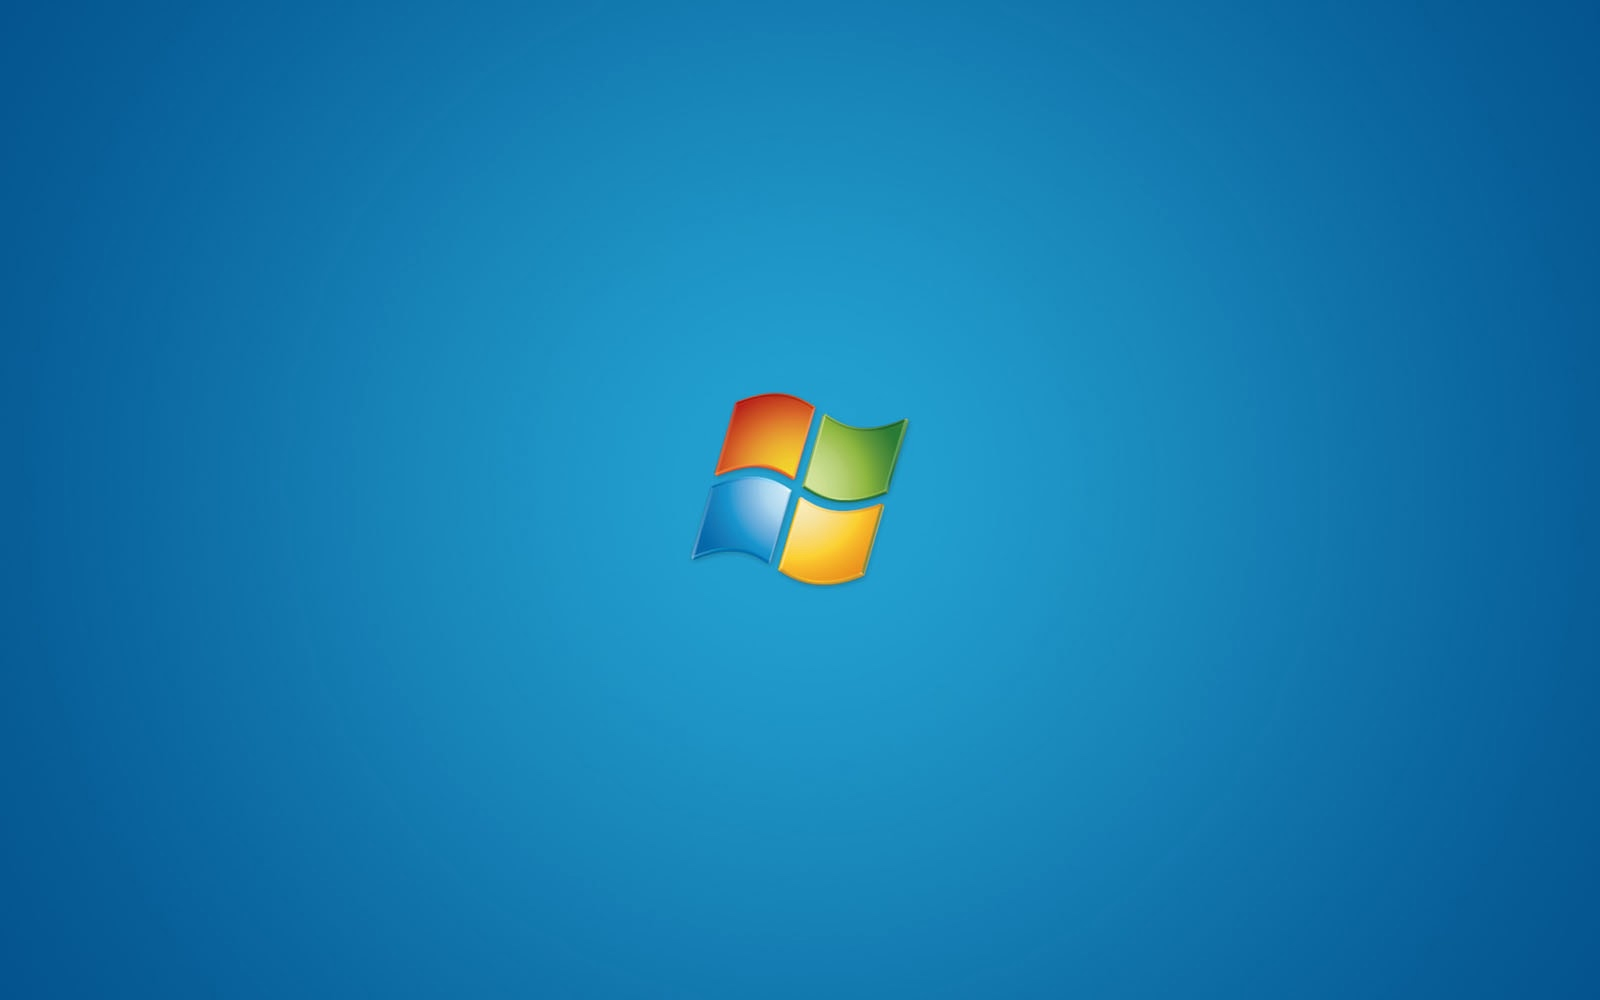 Microsoft Windows Wallpapers